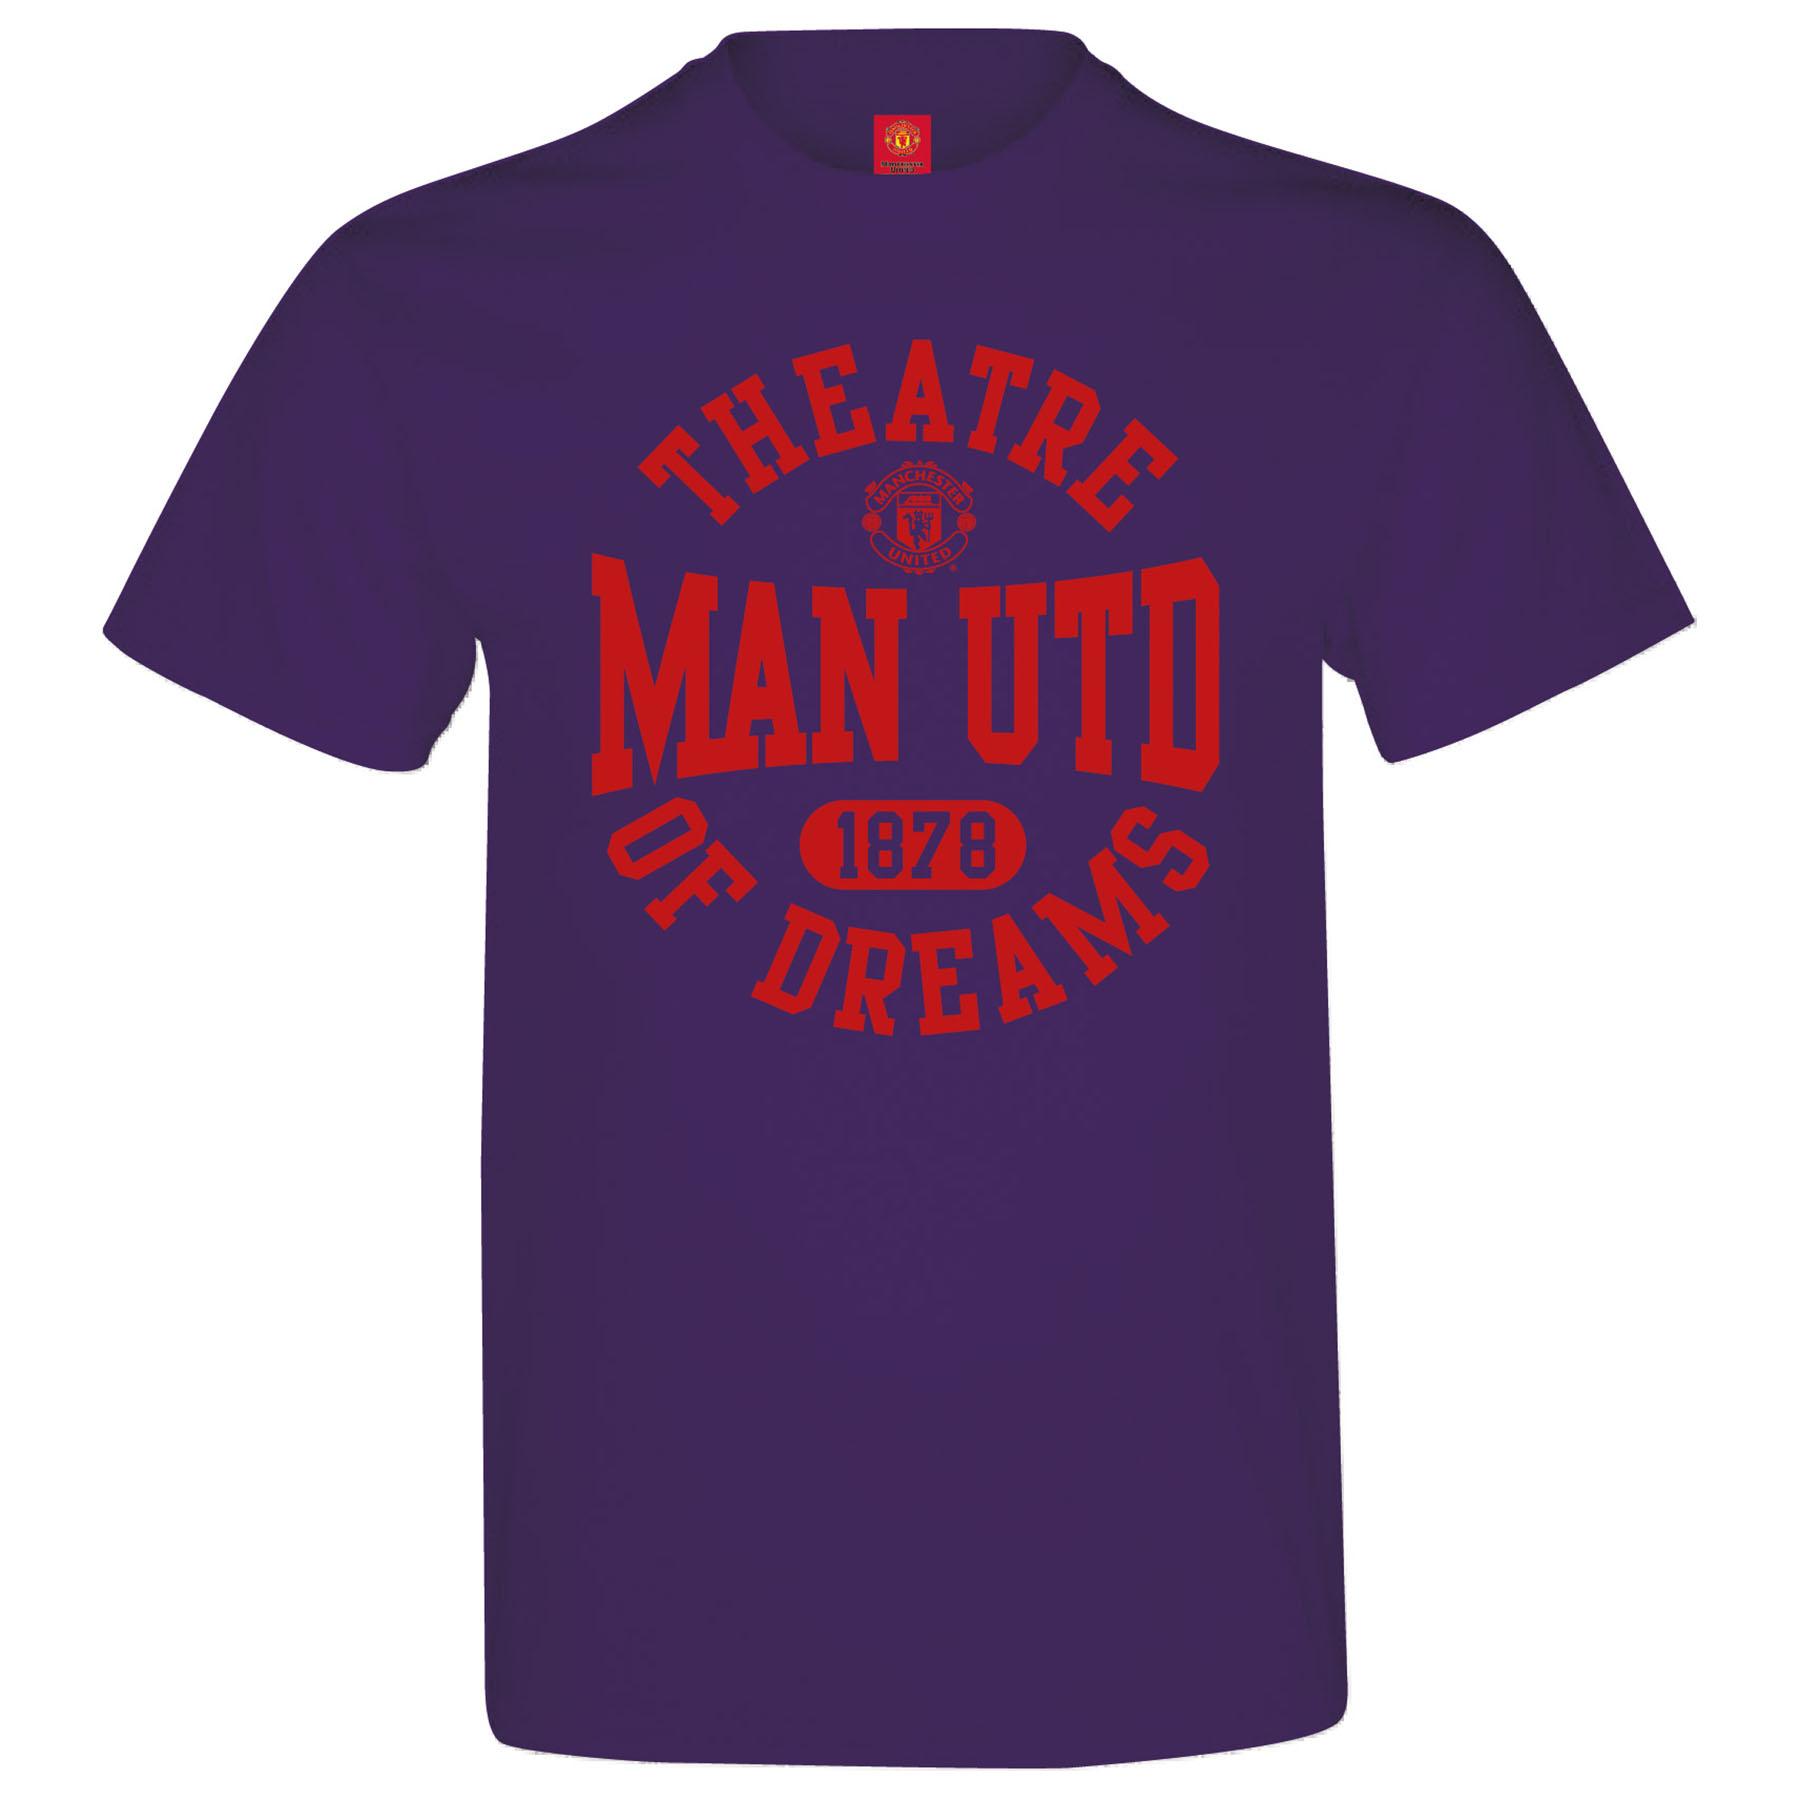 Manchester United Theatre Of Dreams T-Shirt - Purple - Mens